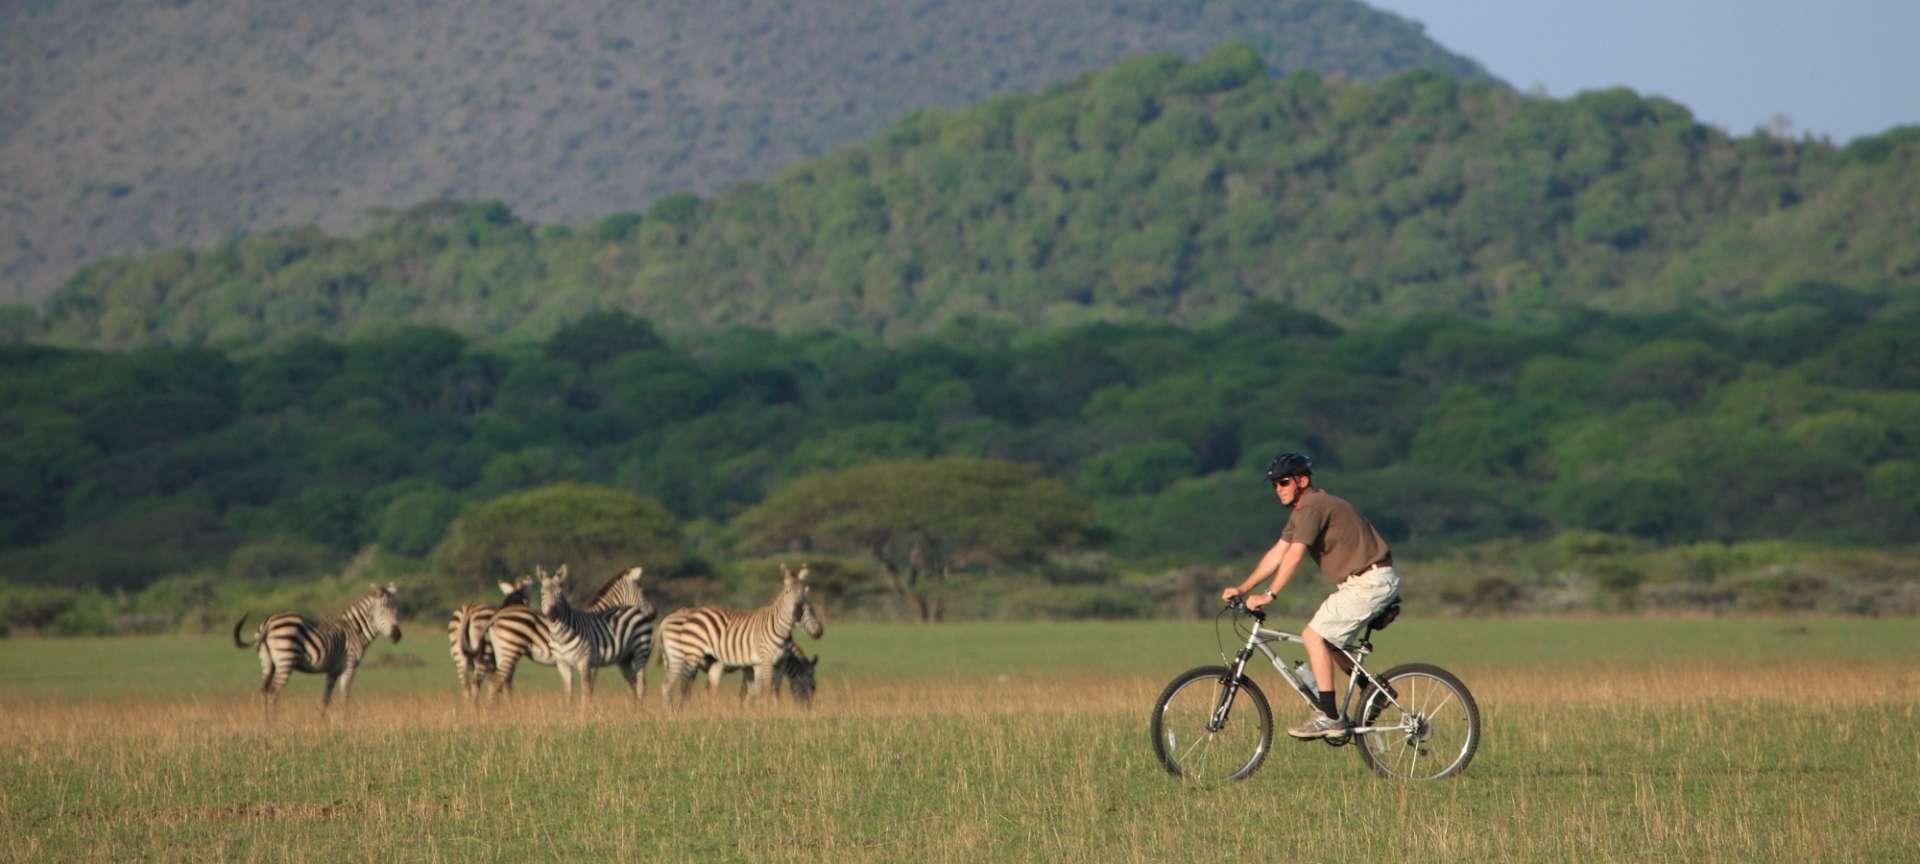 Ol Donyo Sabuk - Africa Wildlife Safaris